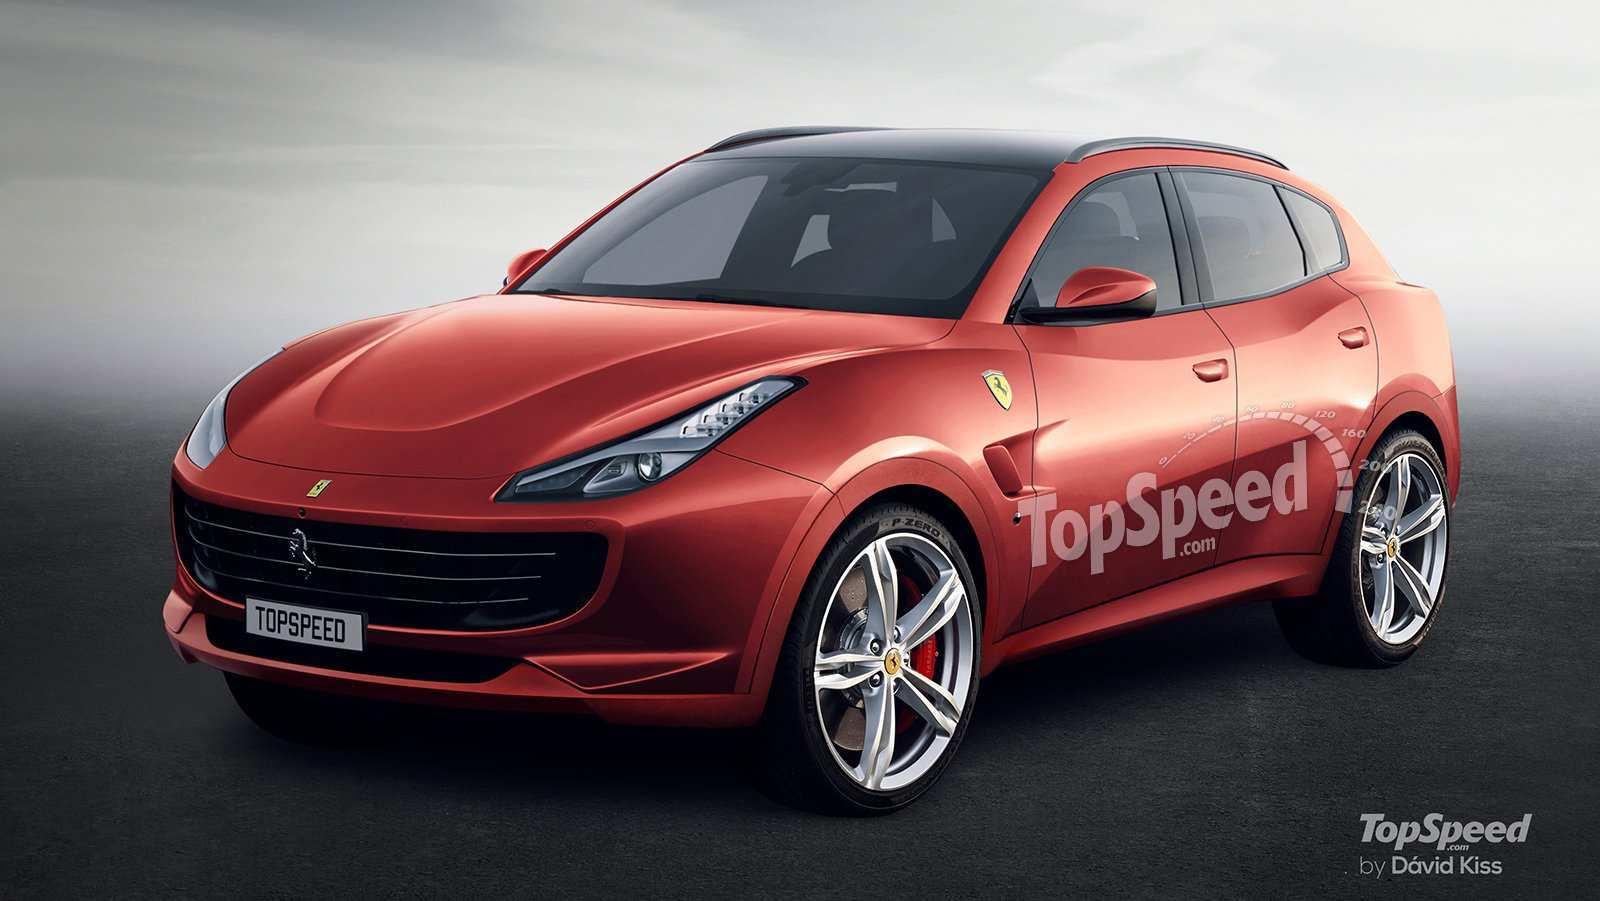 58 New Ferrari 2020 Price Reviews by Ferrari 2020 Price